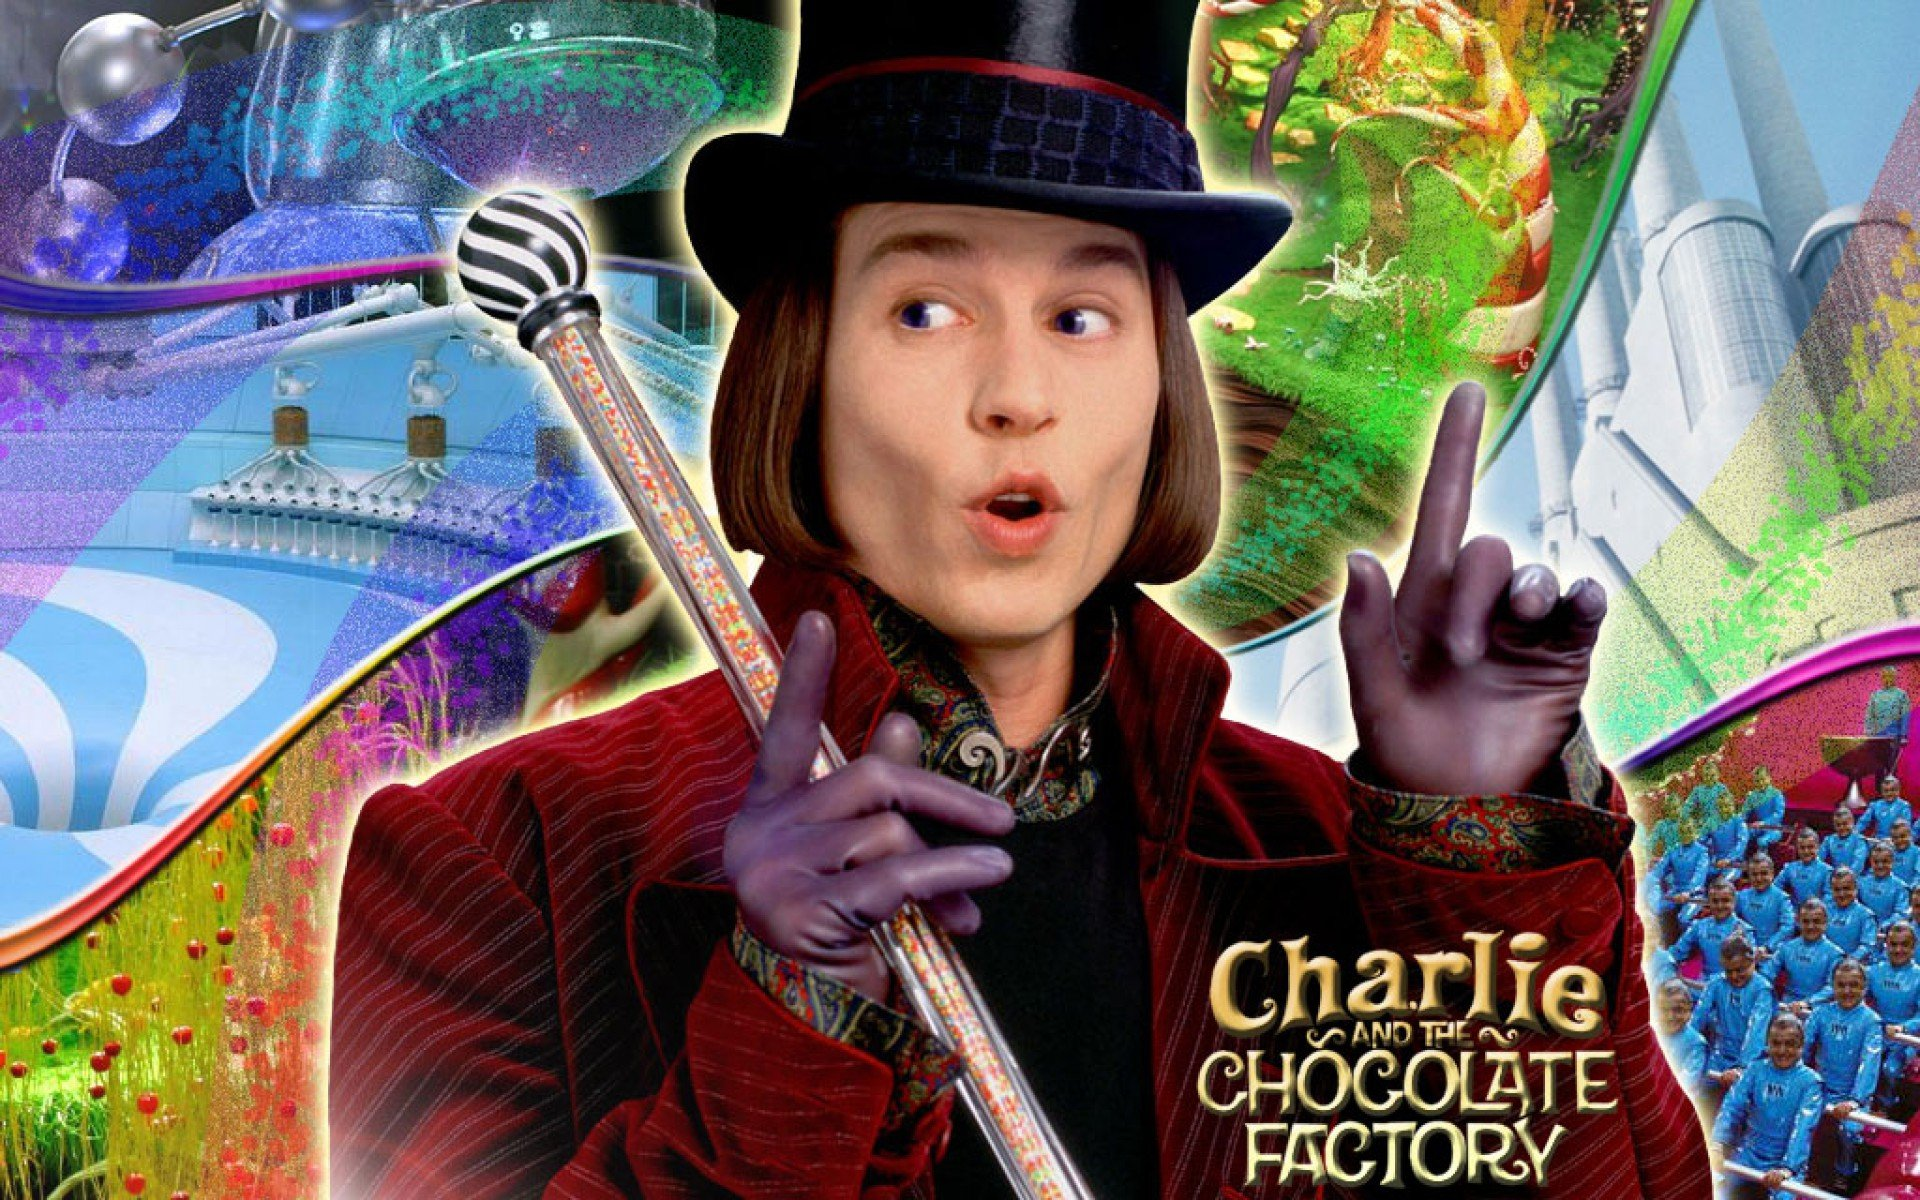 Charlie Chocolate Factory Depp